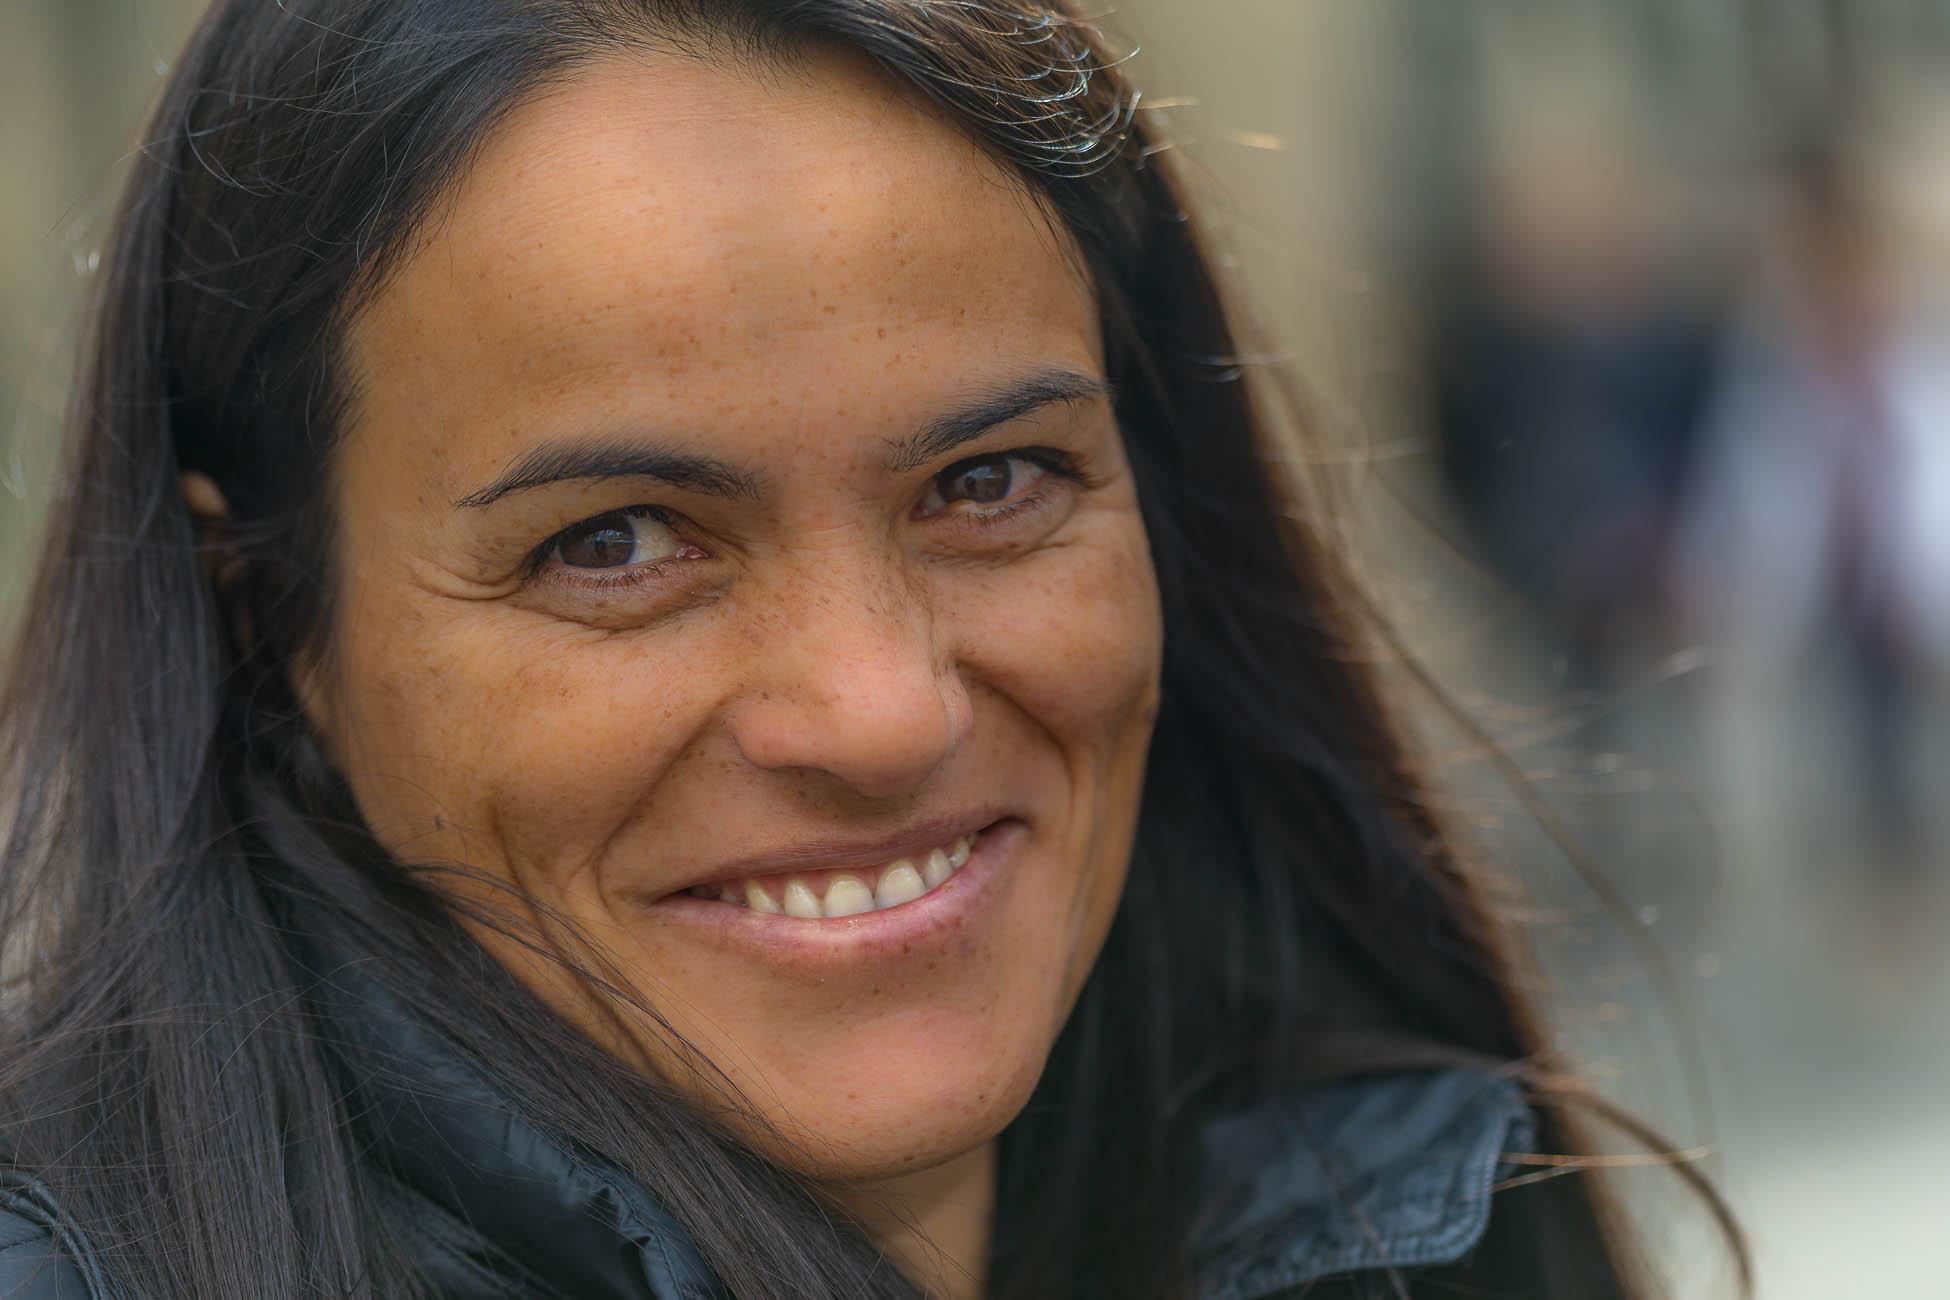 Psychologische Beratung | Personal Coach - Personal Trainerin Teresa Bruckner